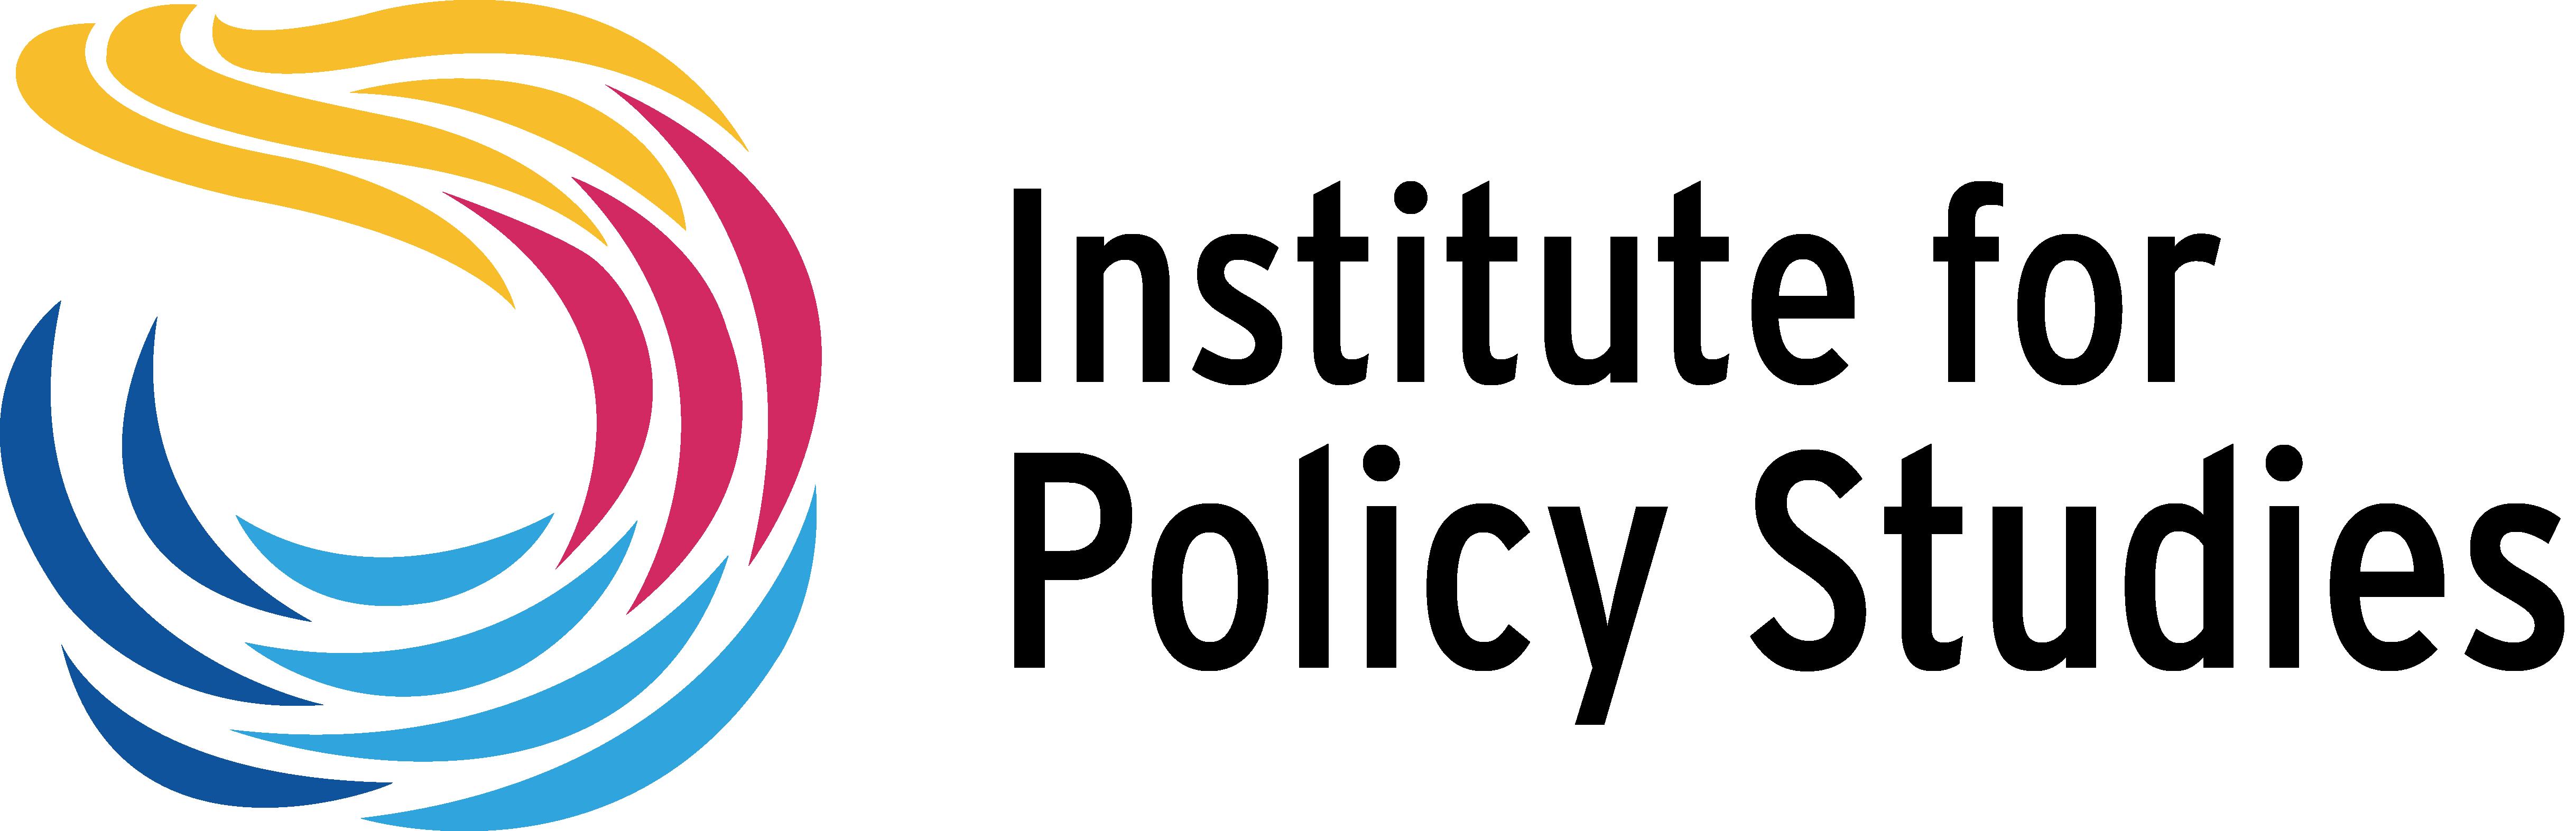 IPS_2014_logo